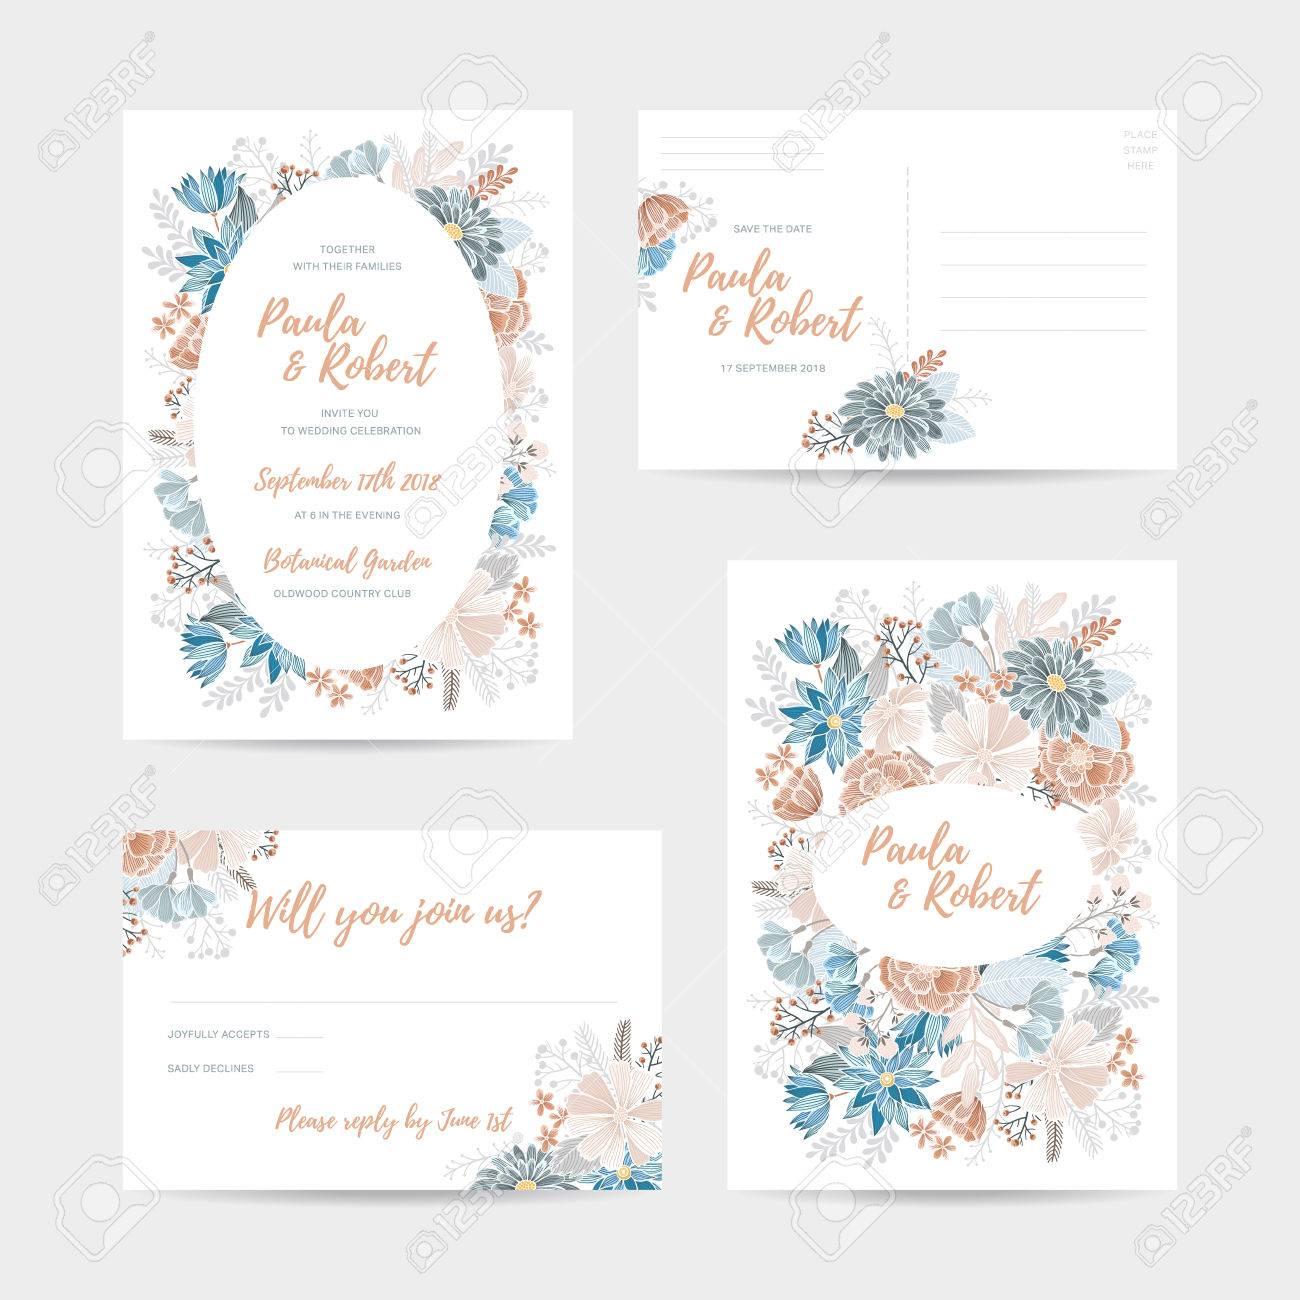 Wedding Invitation Card Set. Invitation, Save The Date, RSVP ...